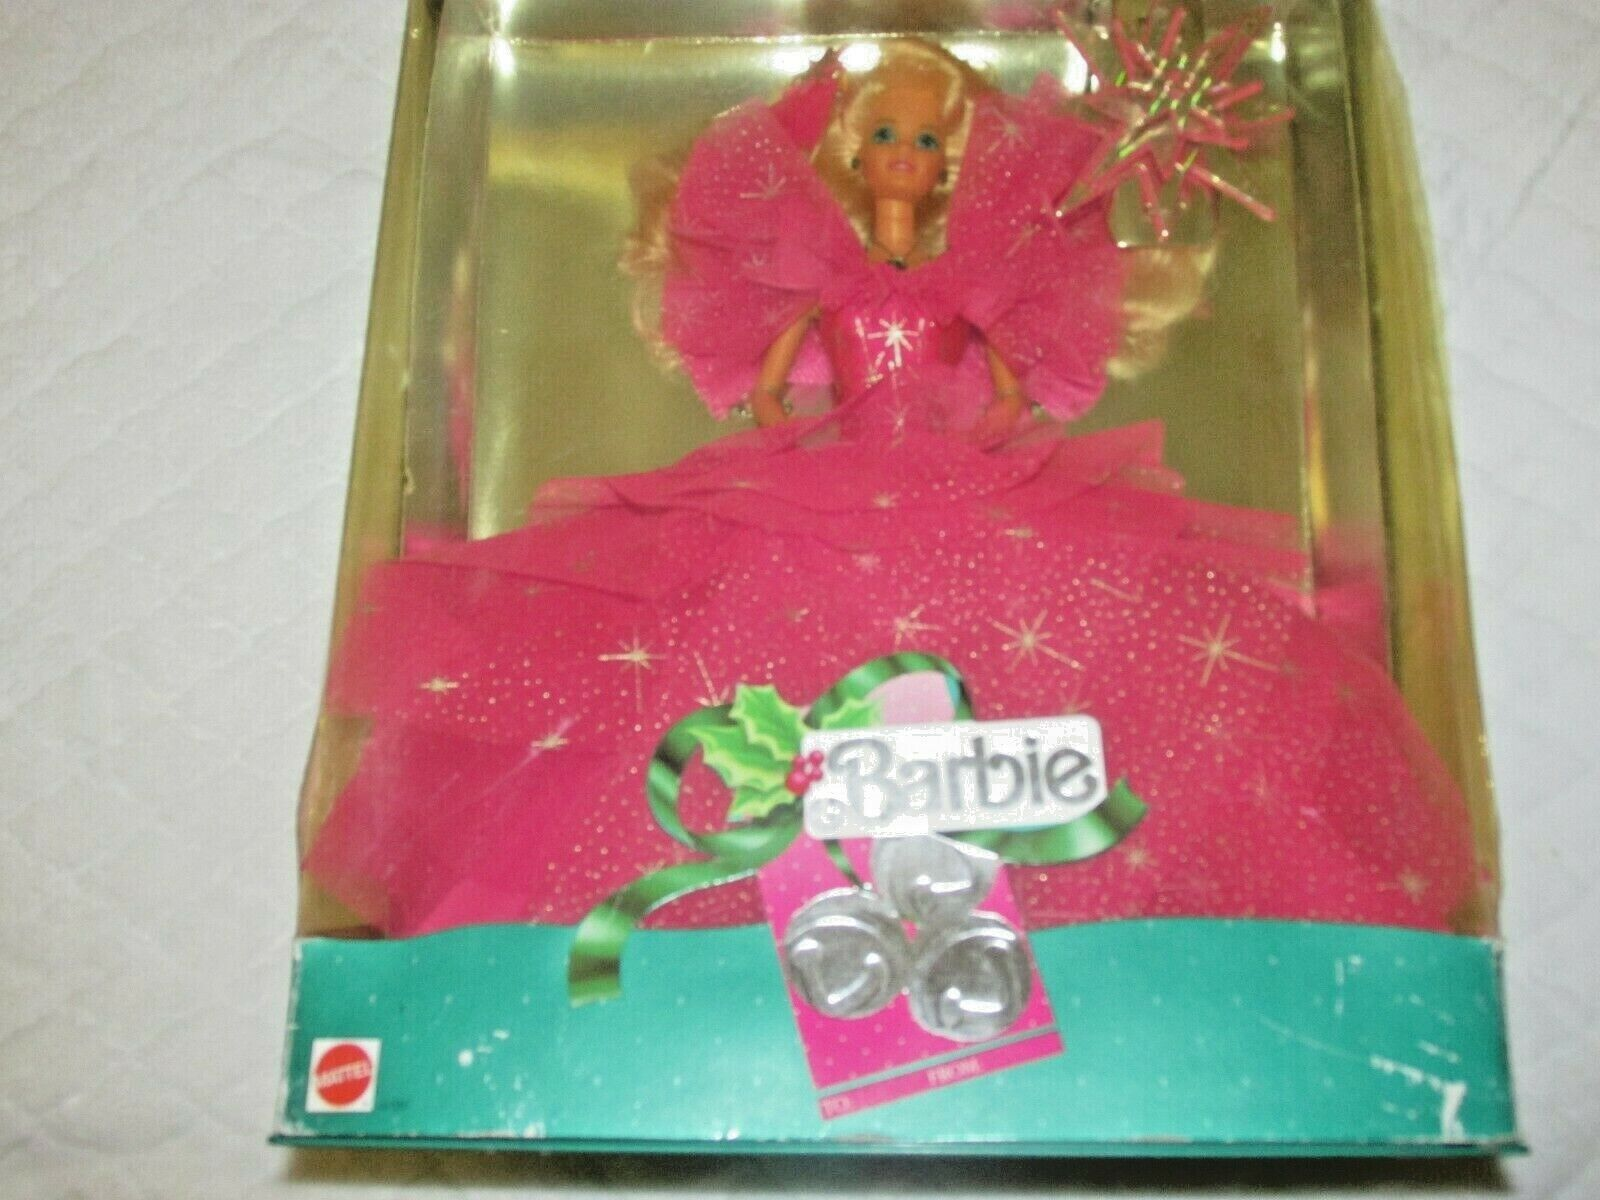 1990 Barbie Happy Holiday Special Edition